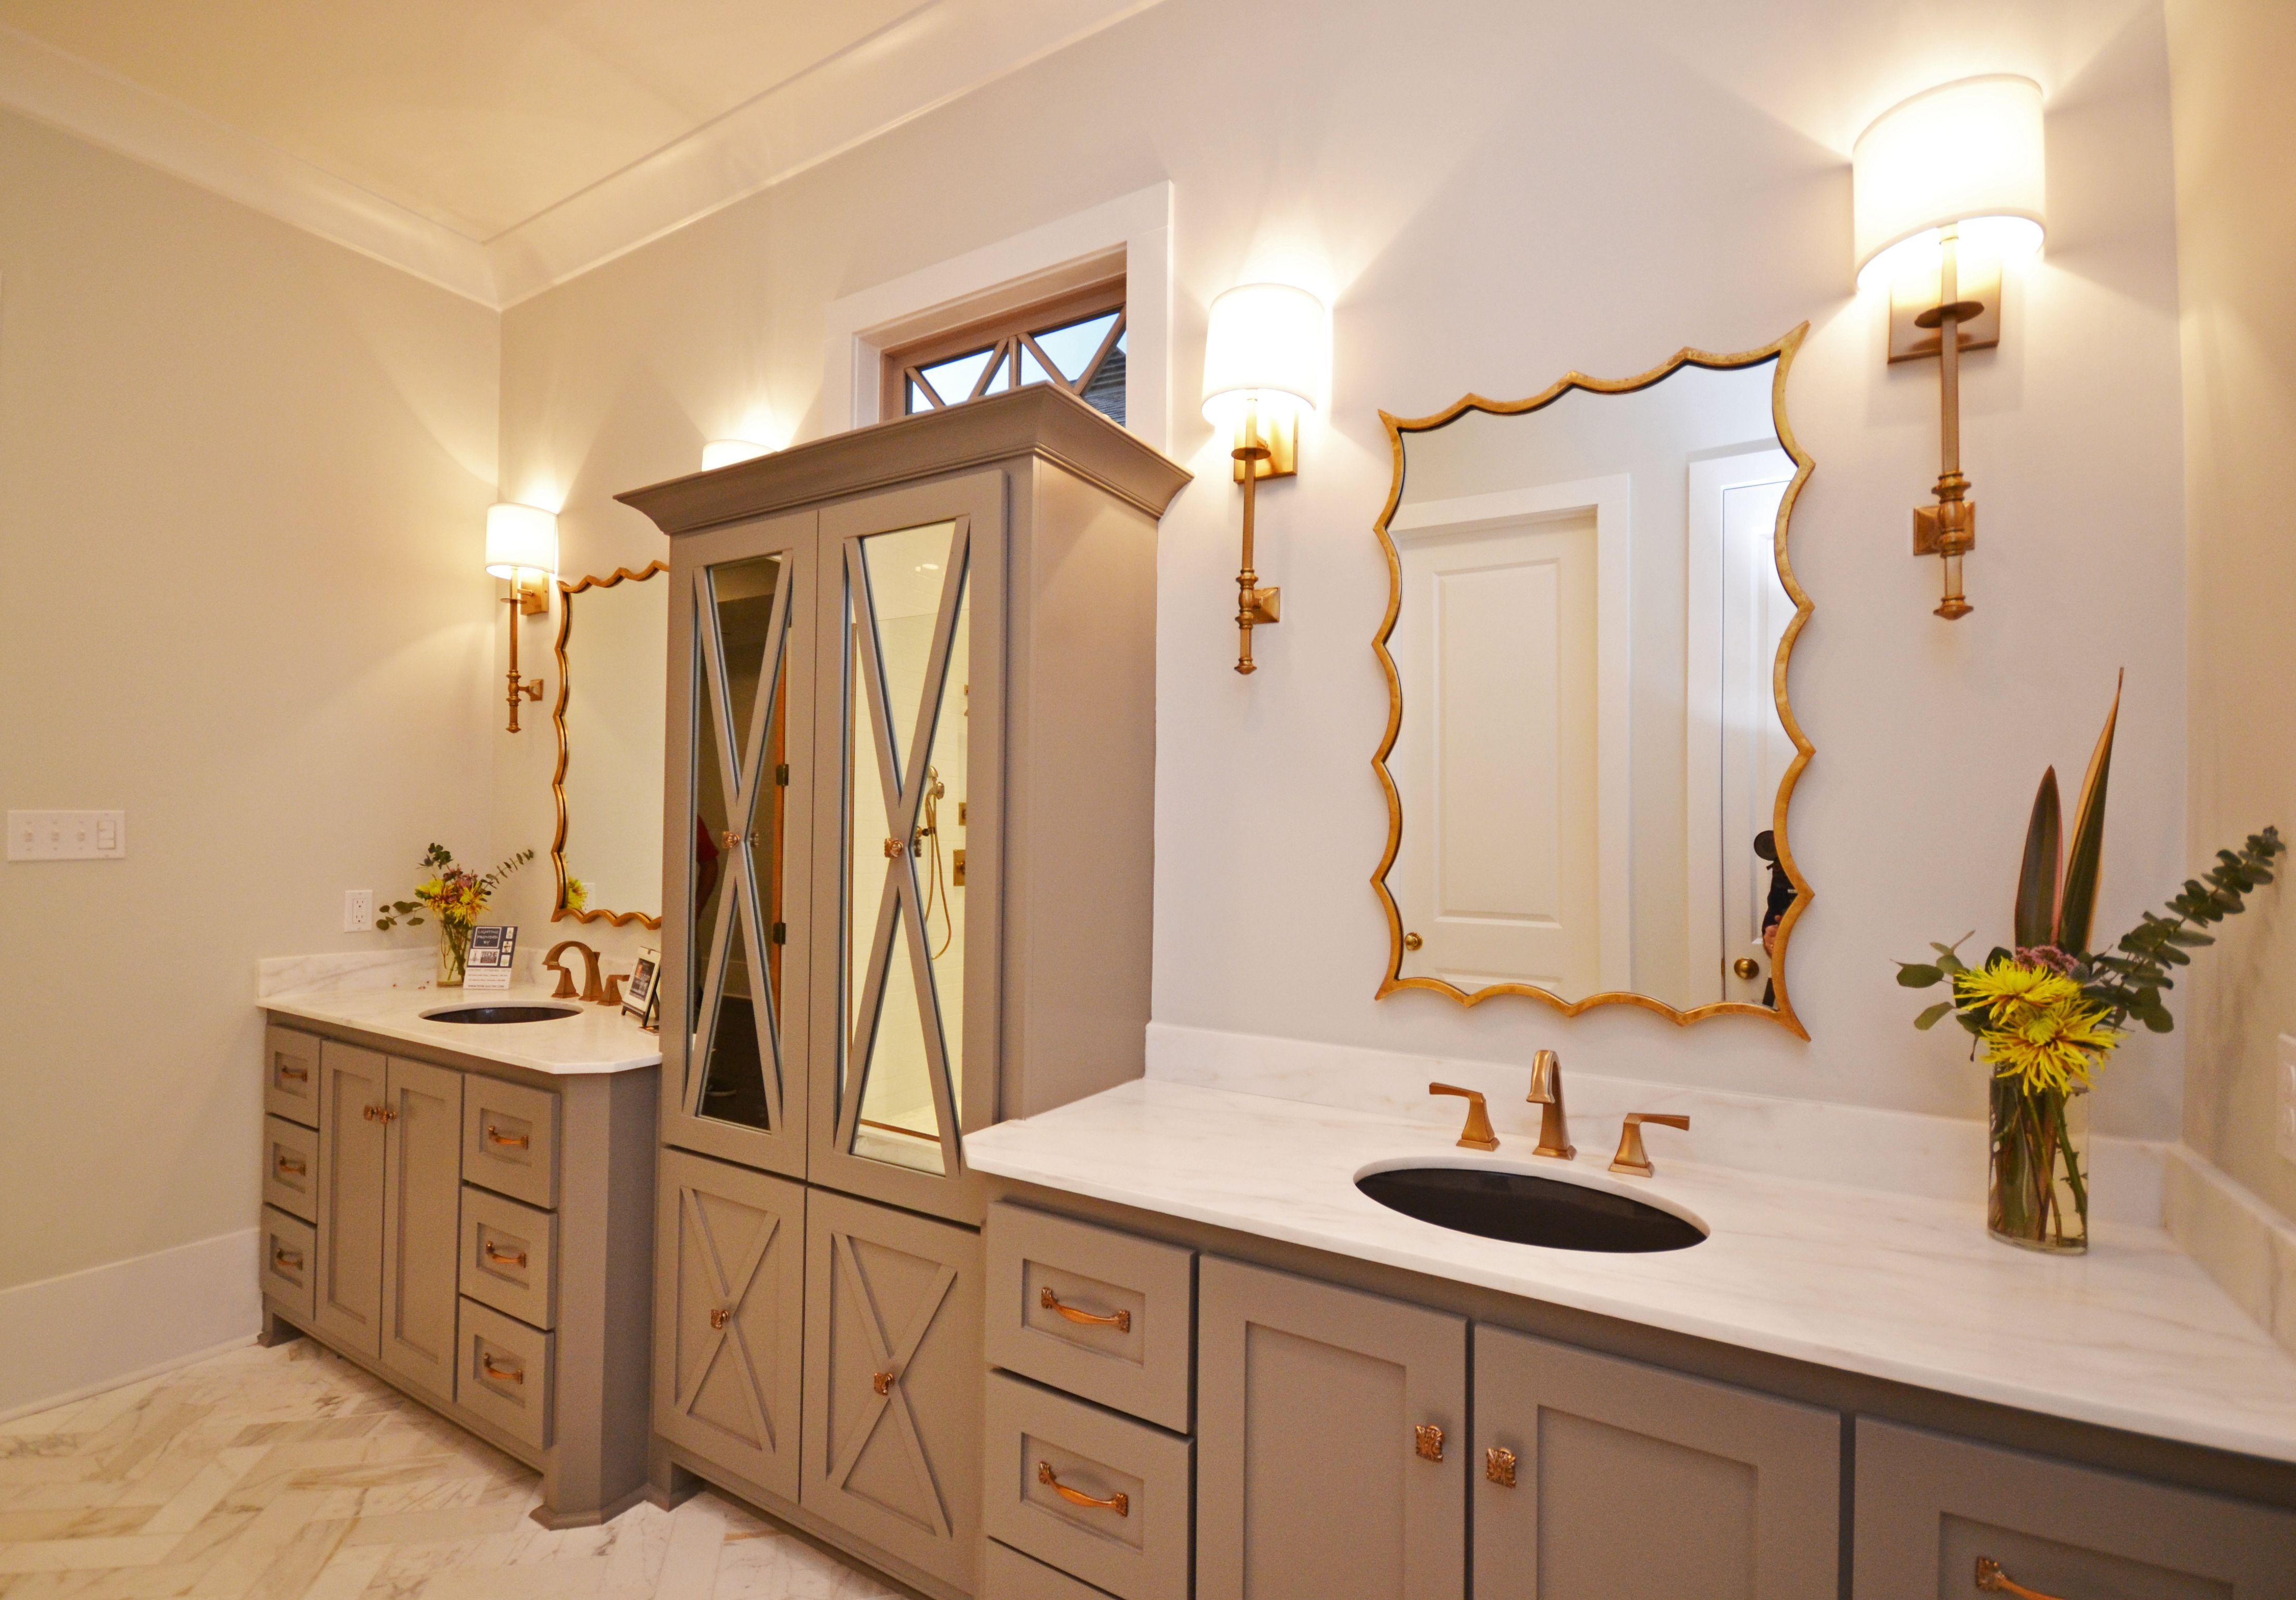 Master Bath with brass hardware Casiewebbdesigns Ketteringham Builders